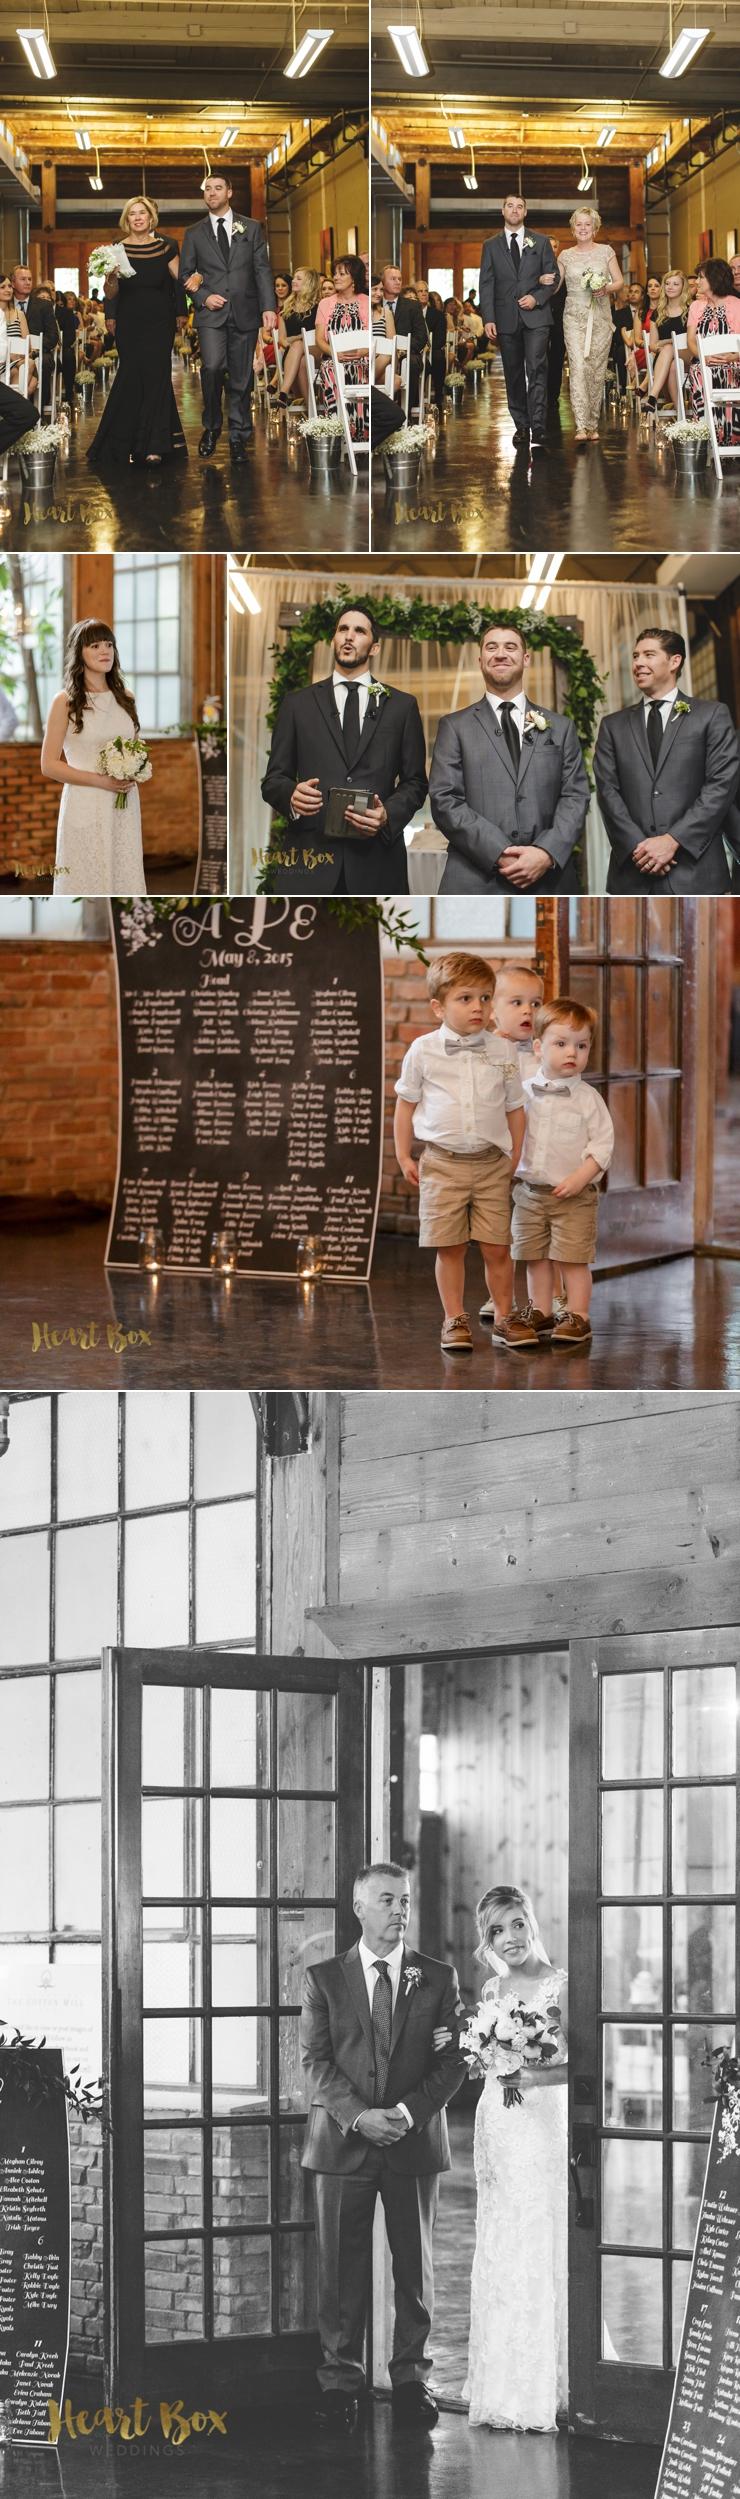 Popplewell Wedding Blog Collages 17.jpg